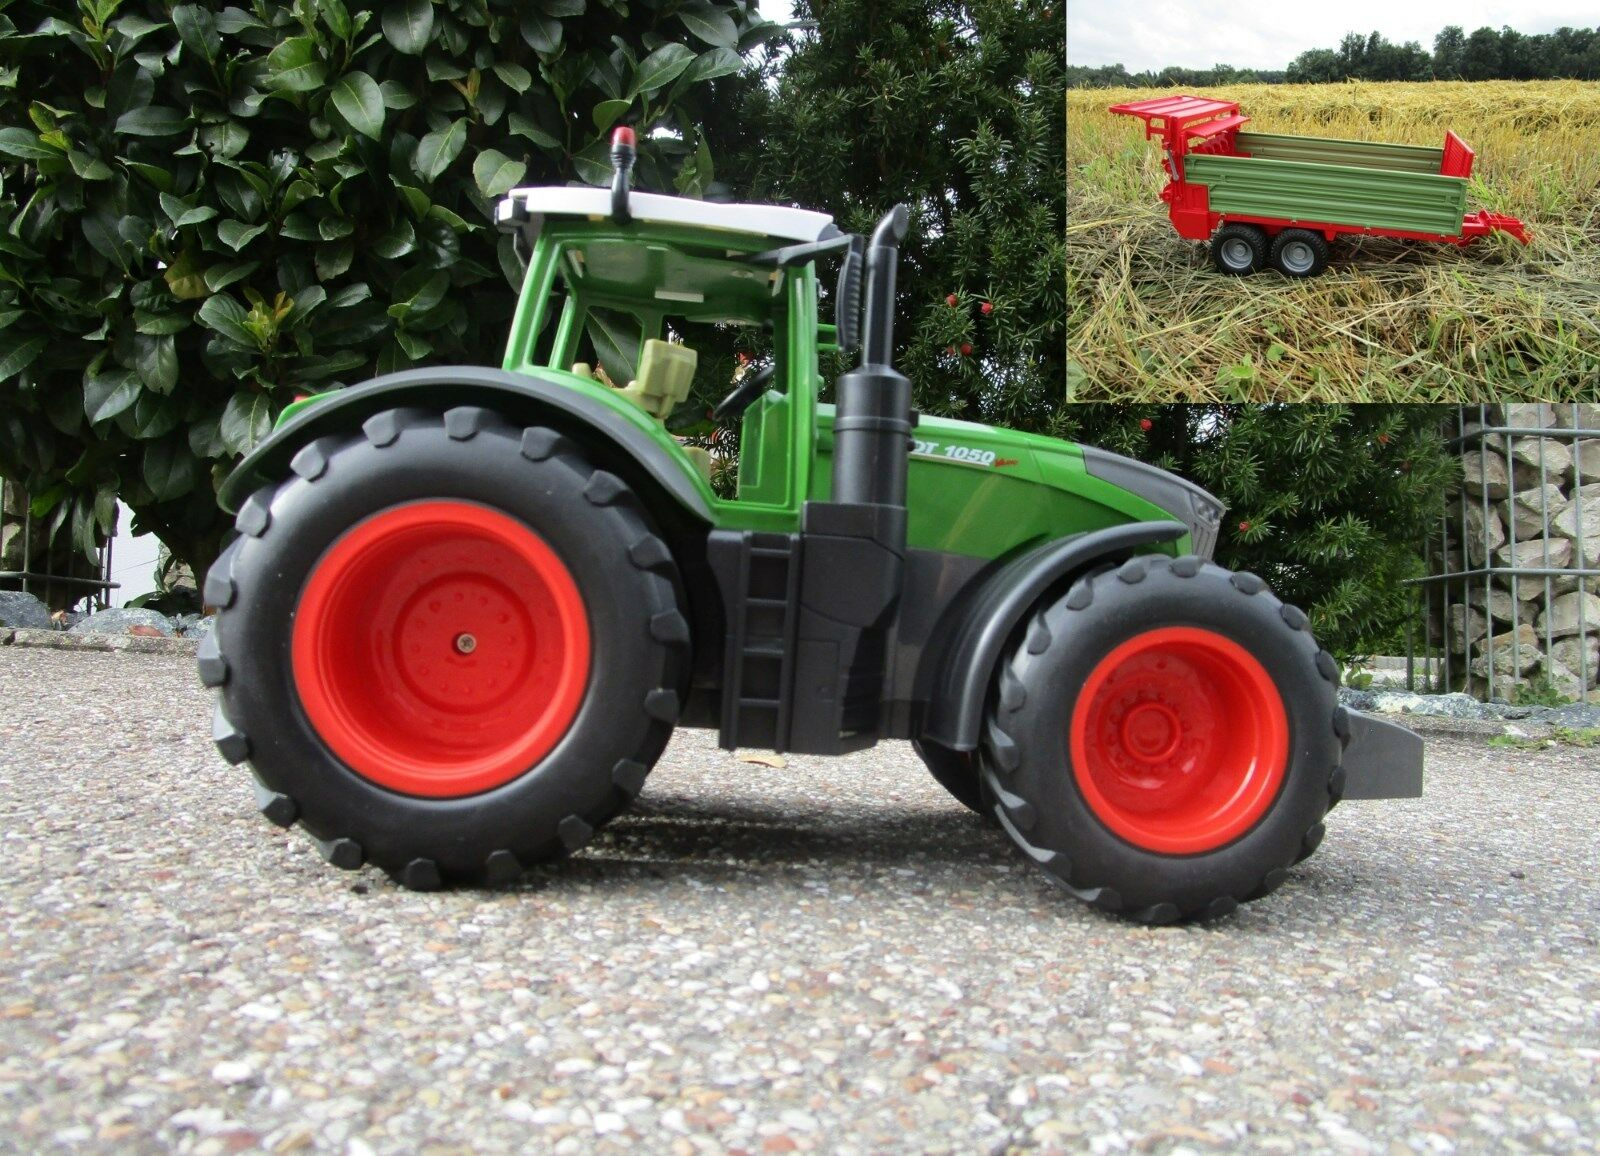 2RC Traktor Fendt 1050 Vario mit Anhänger-Stalldungstreuer 1:16